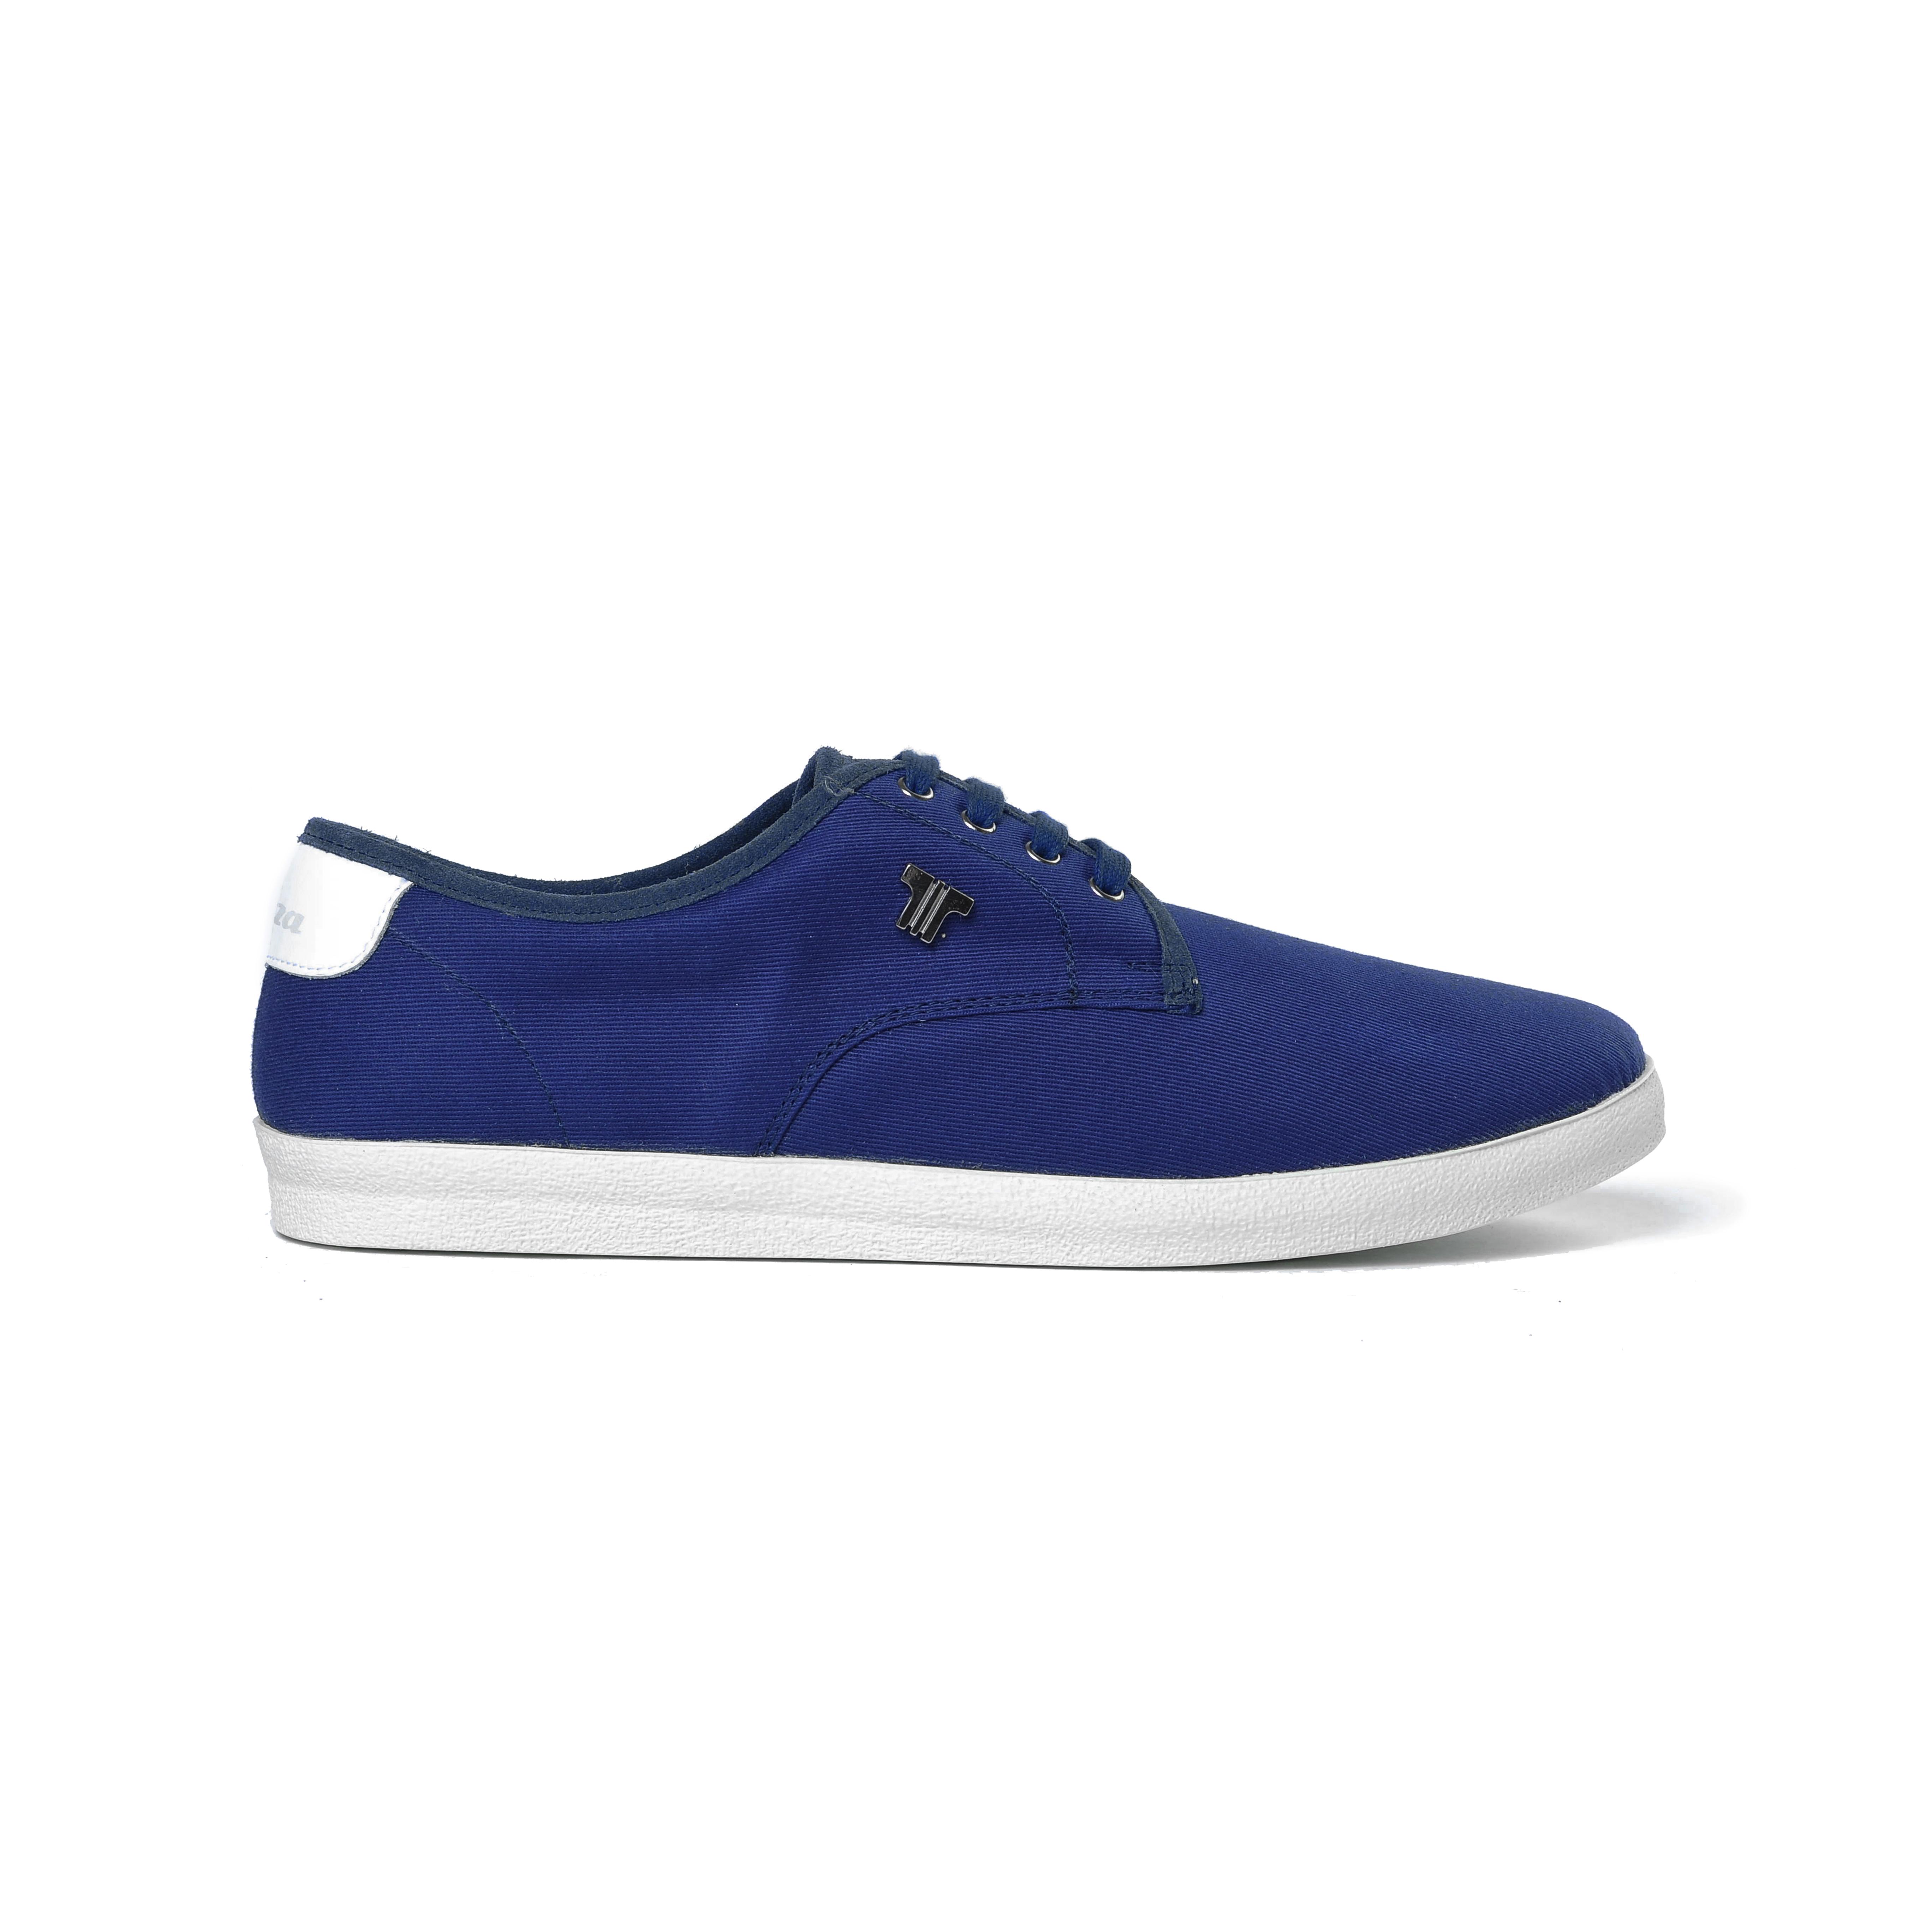 Tisza shoes - City - Darkblue-white